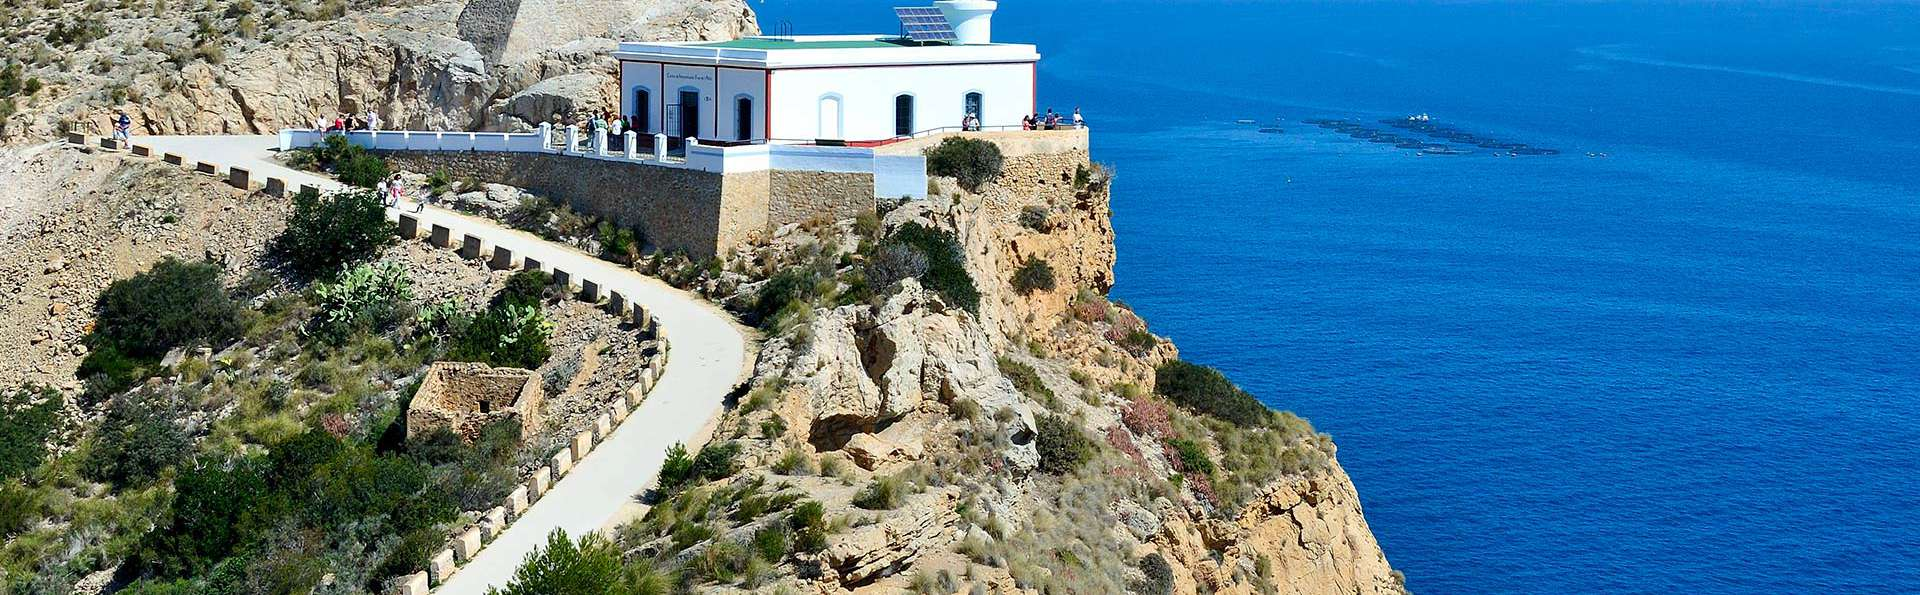 Albir Playa hotel & spa - EDIT_destination2.jpg